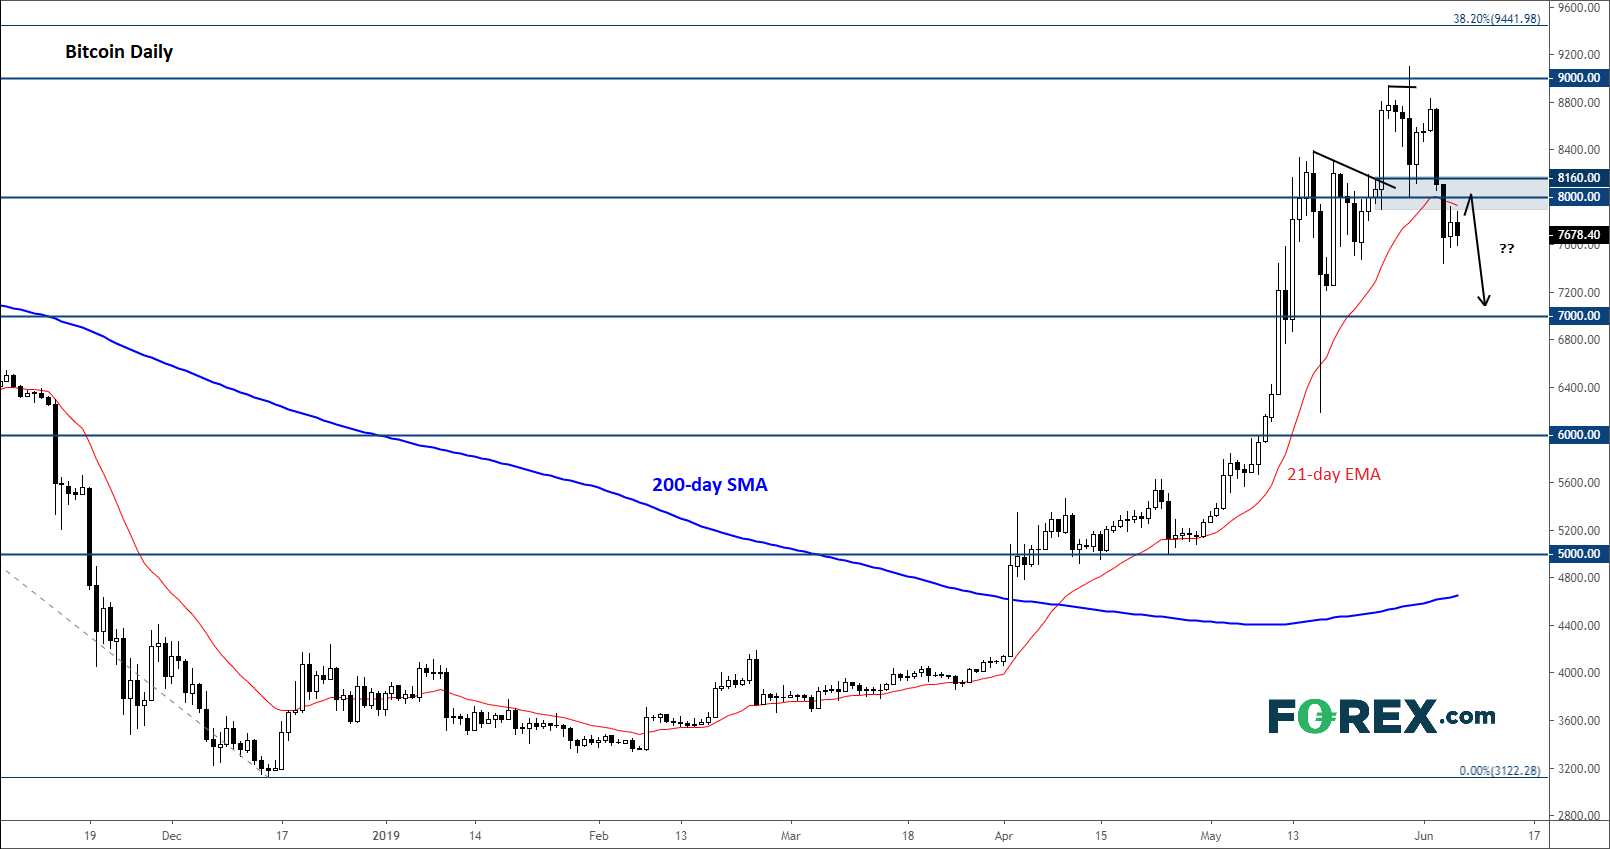 Bitcoin struggles to regain bullish momentum